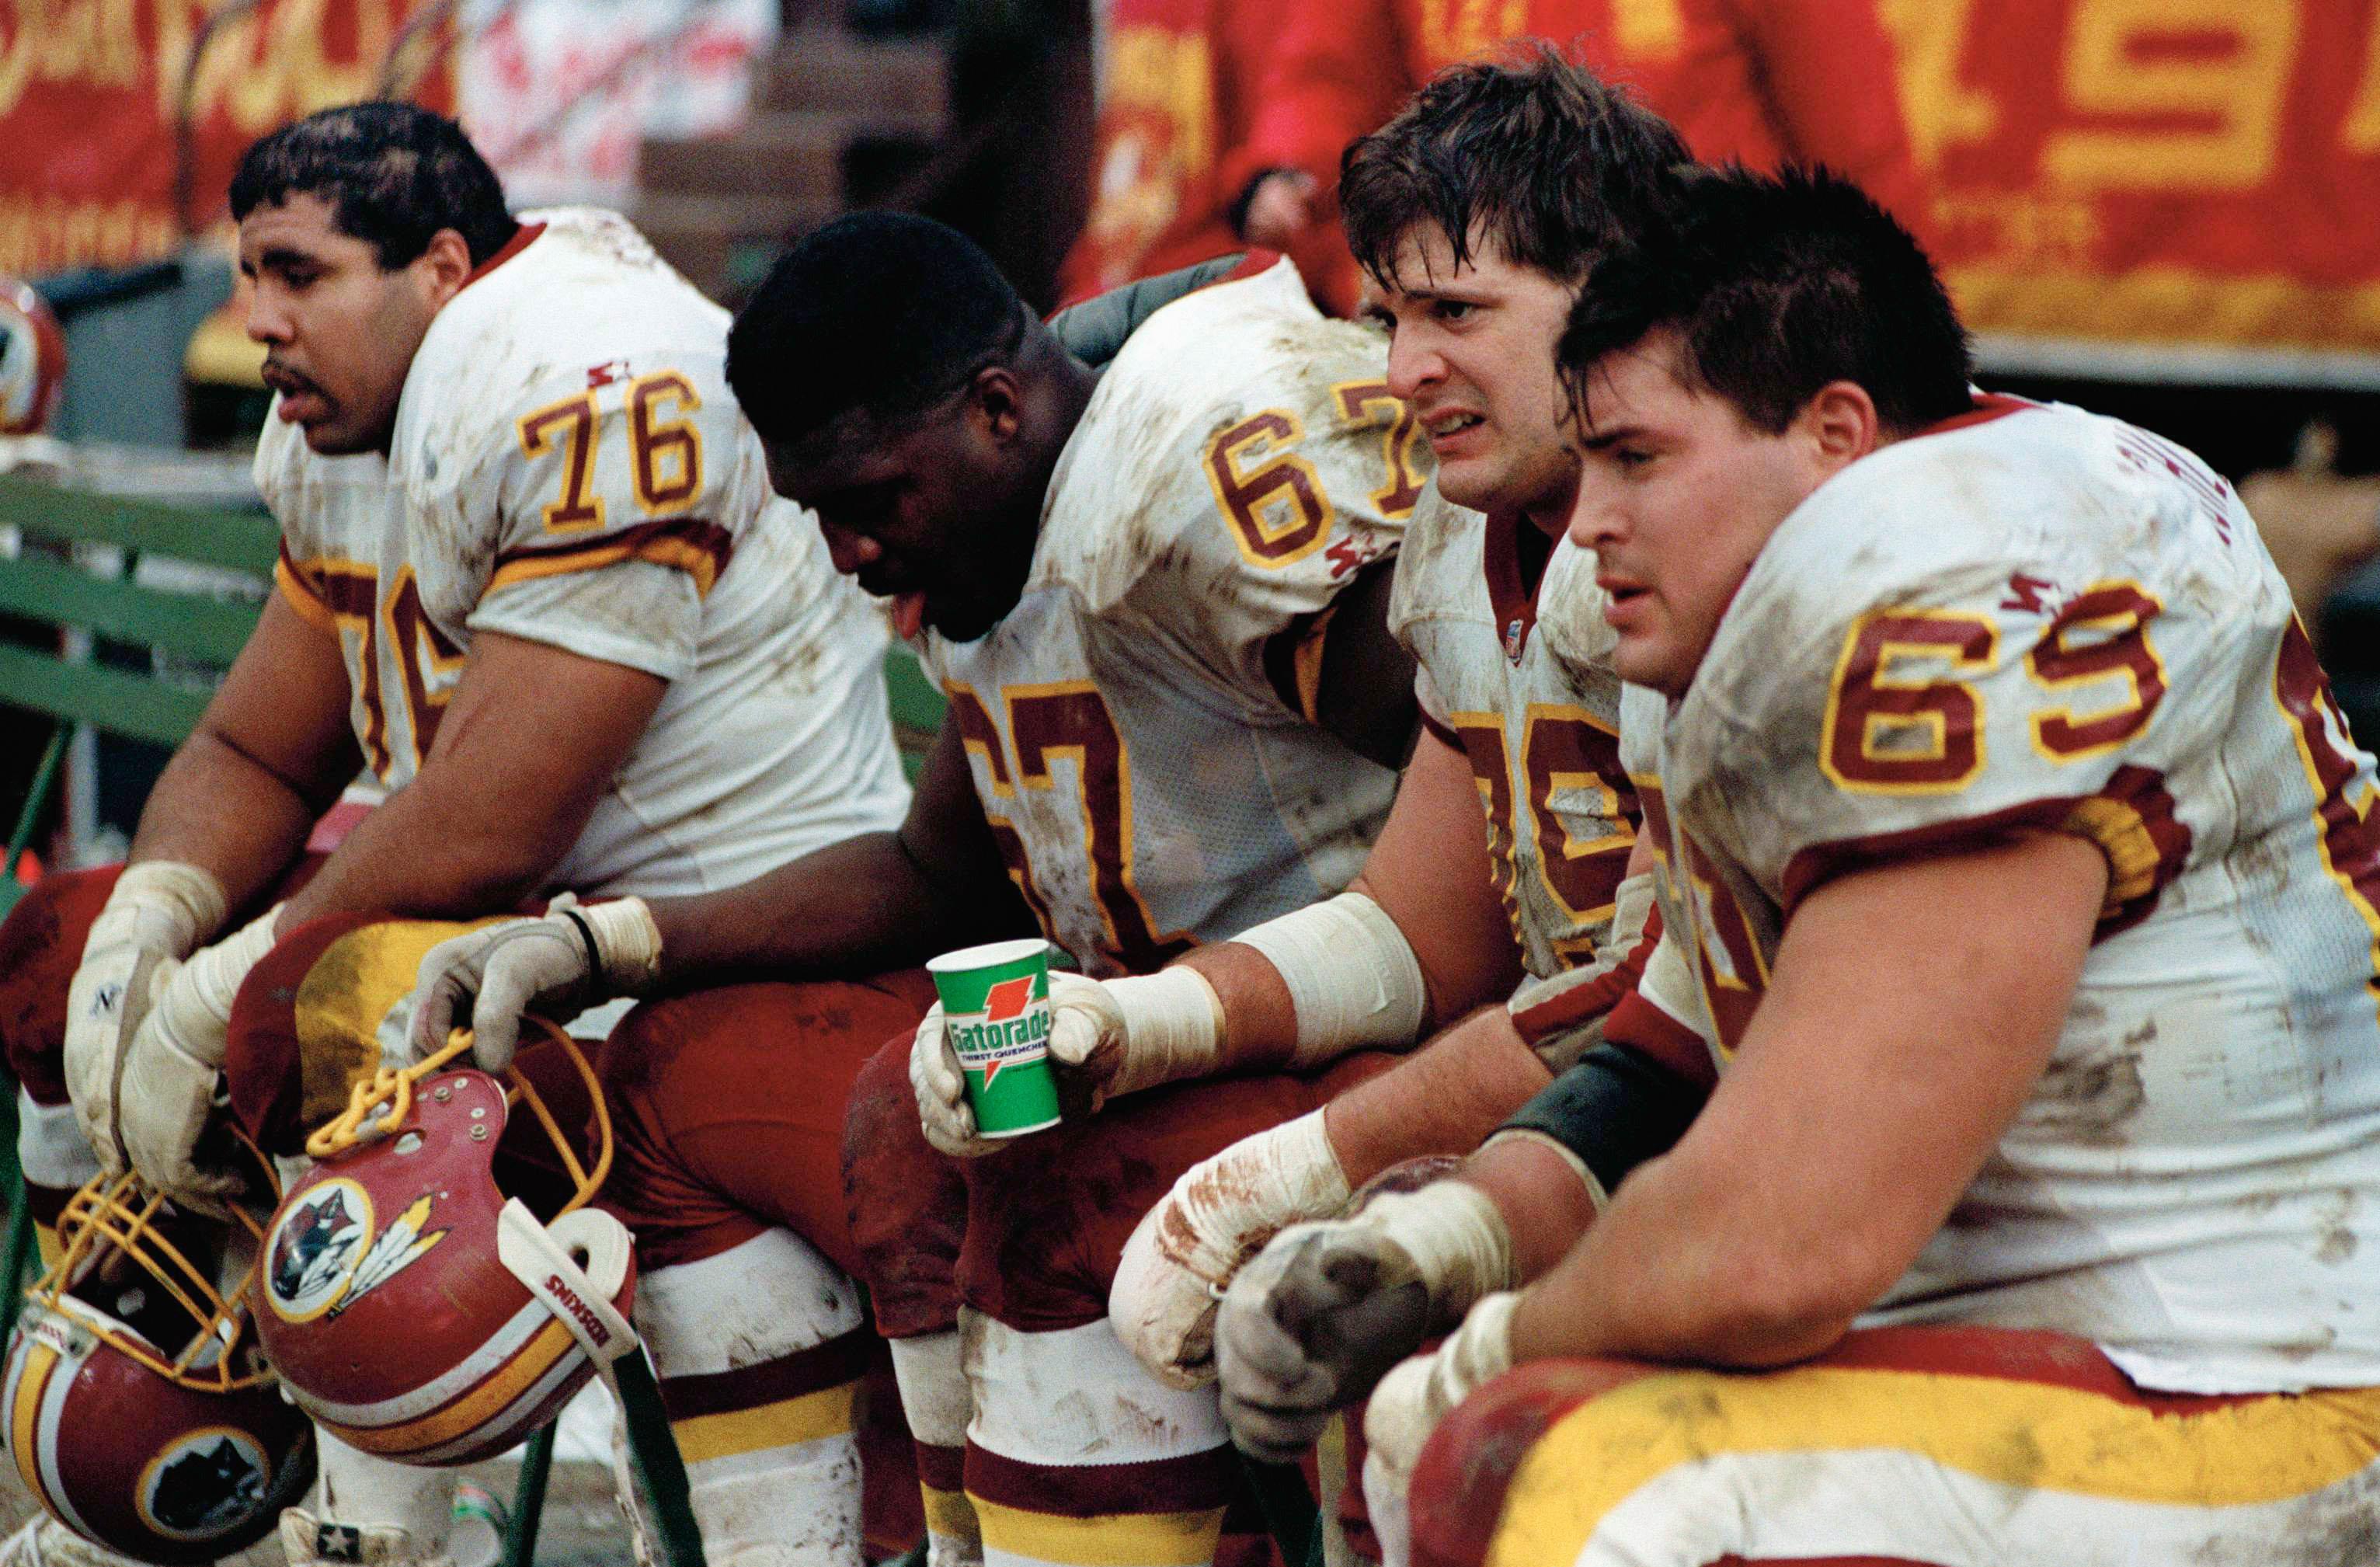 Mark Schlereth and Redskins offensive linemen